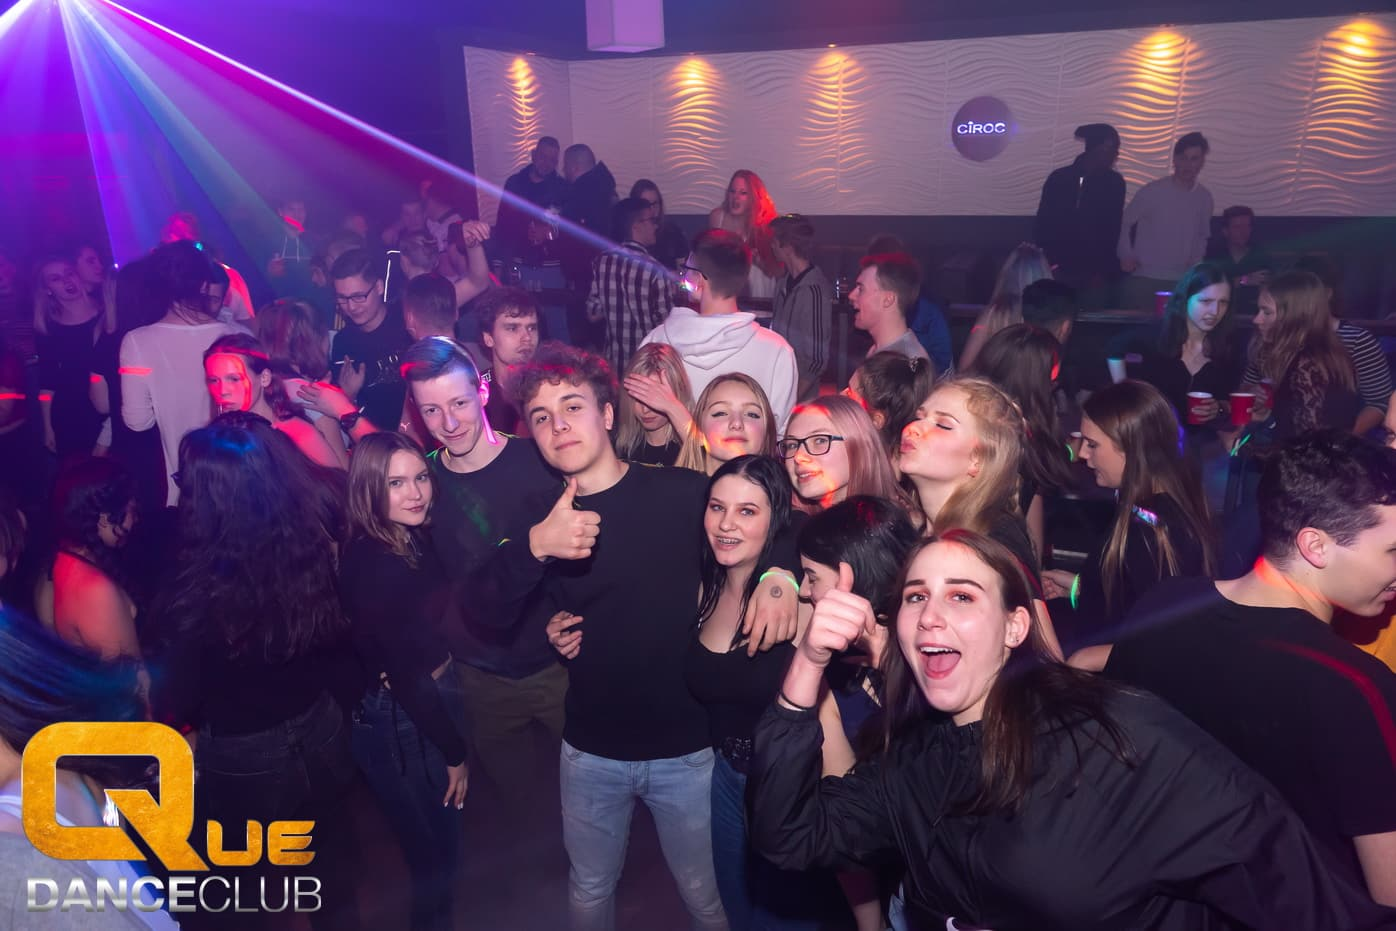 2019_02_15_Que_Danceclub_Secret_Kiss_Nightlife_Scene_Timo_036